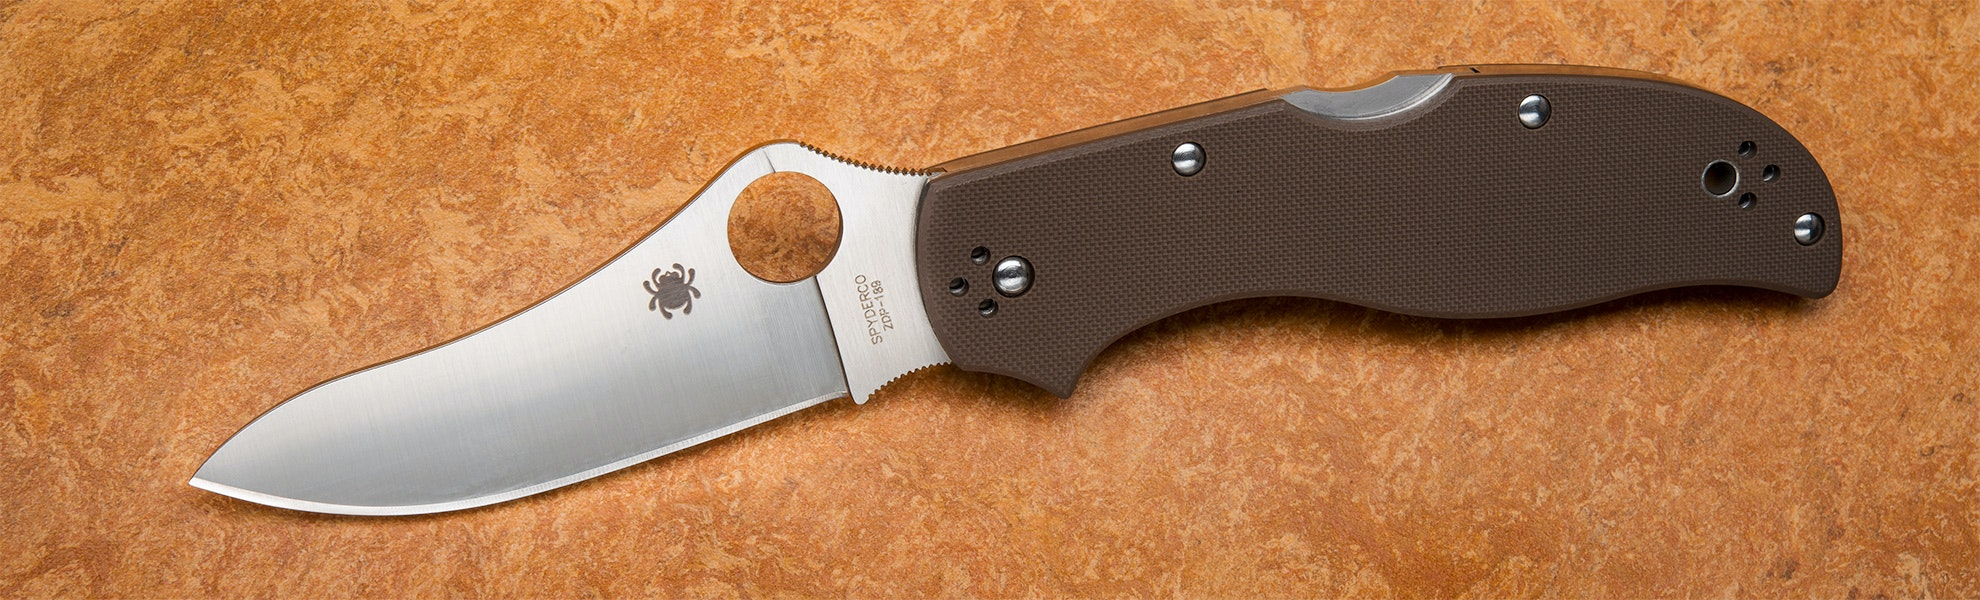 Spyderco Stretch 2 (ZDP-189 Blade)